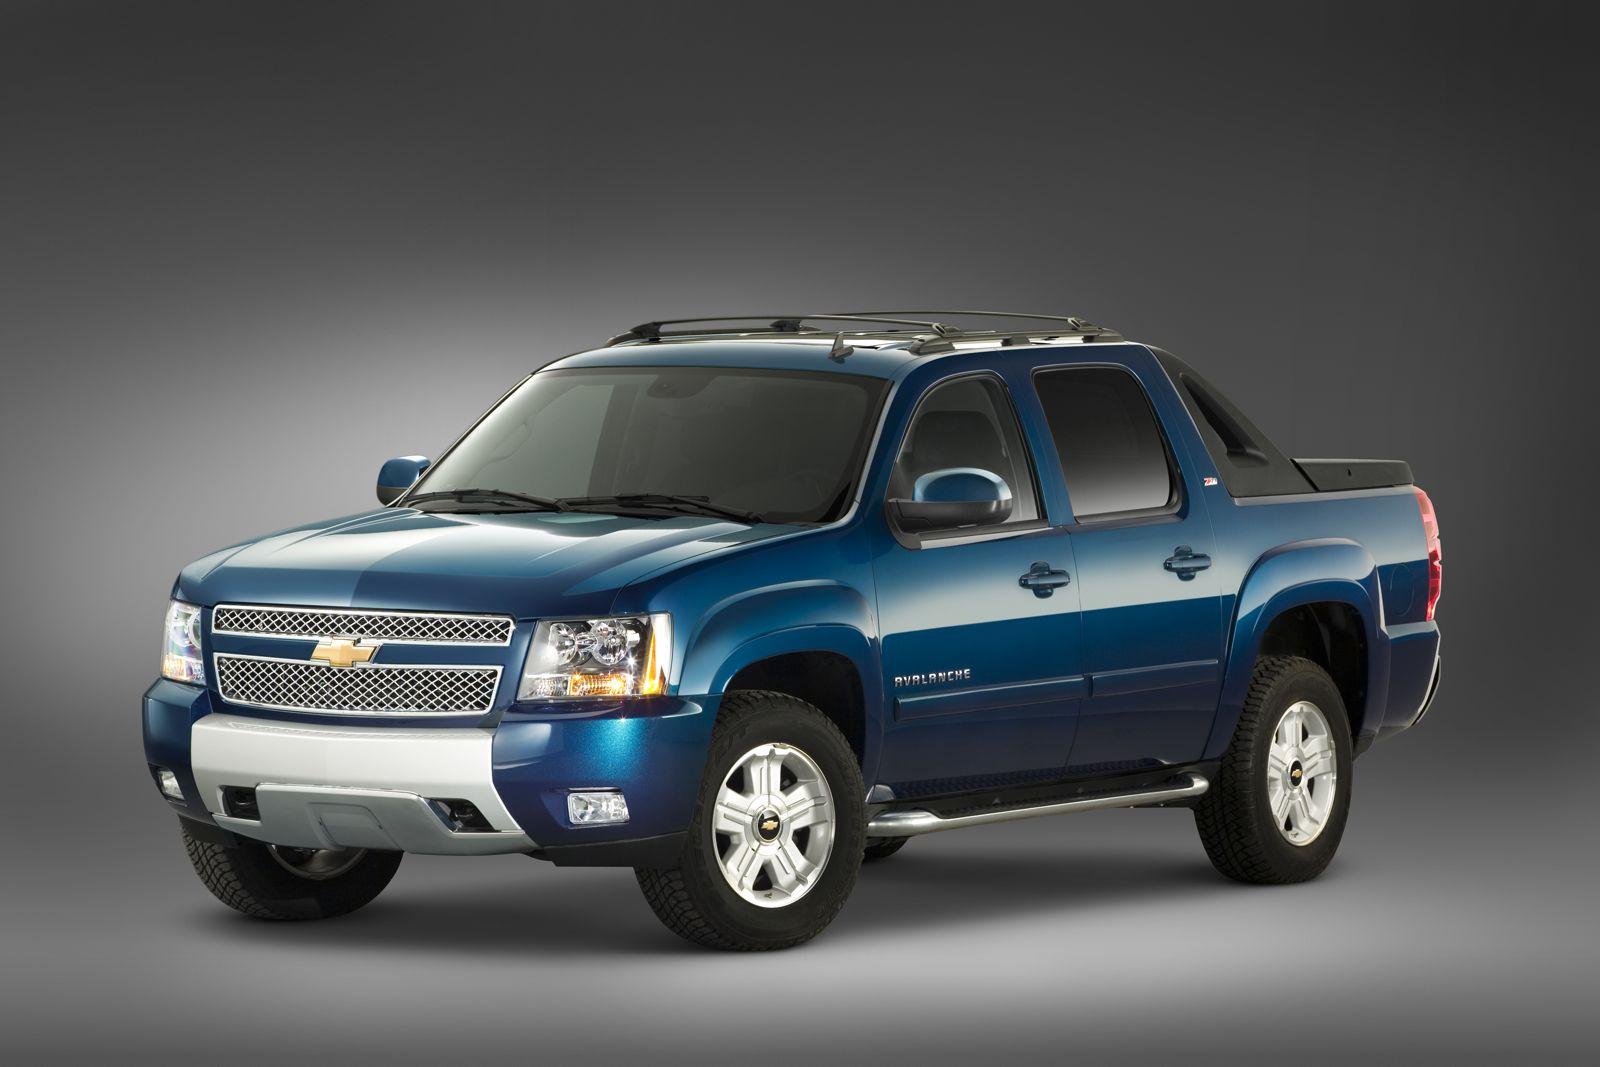 Kelebihan Kekurangan Chevrolet Avalanche Murah Berkualitas